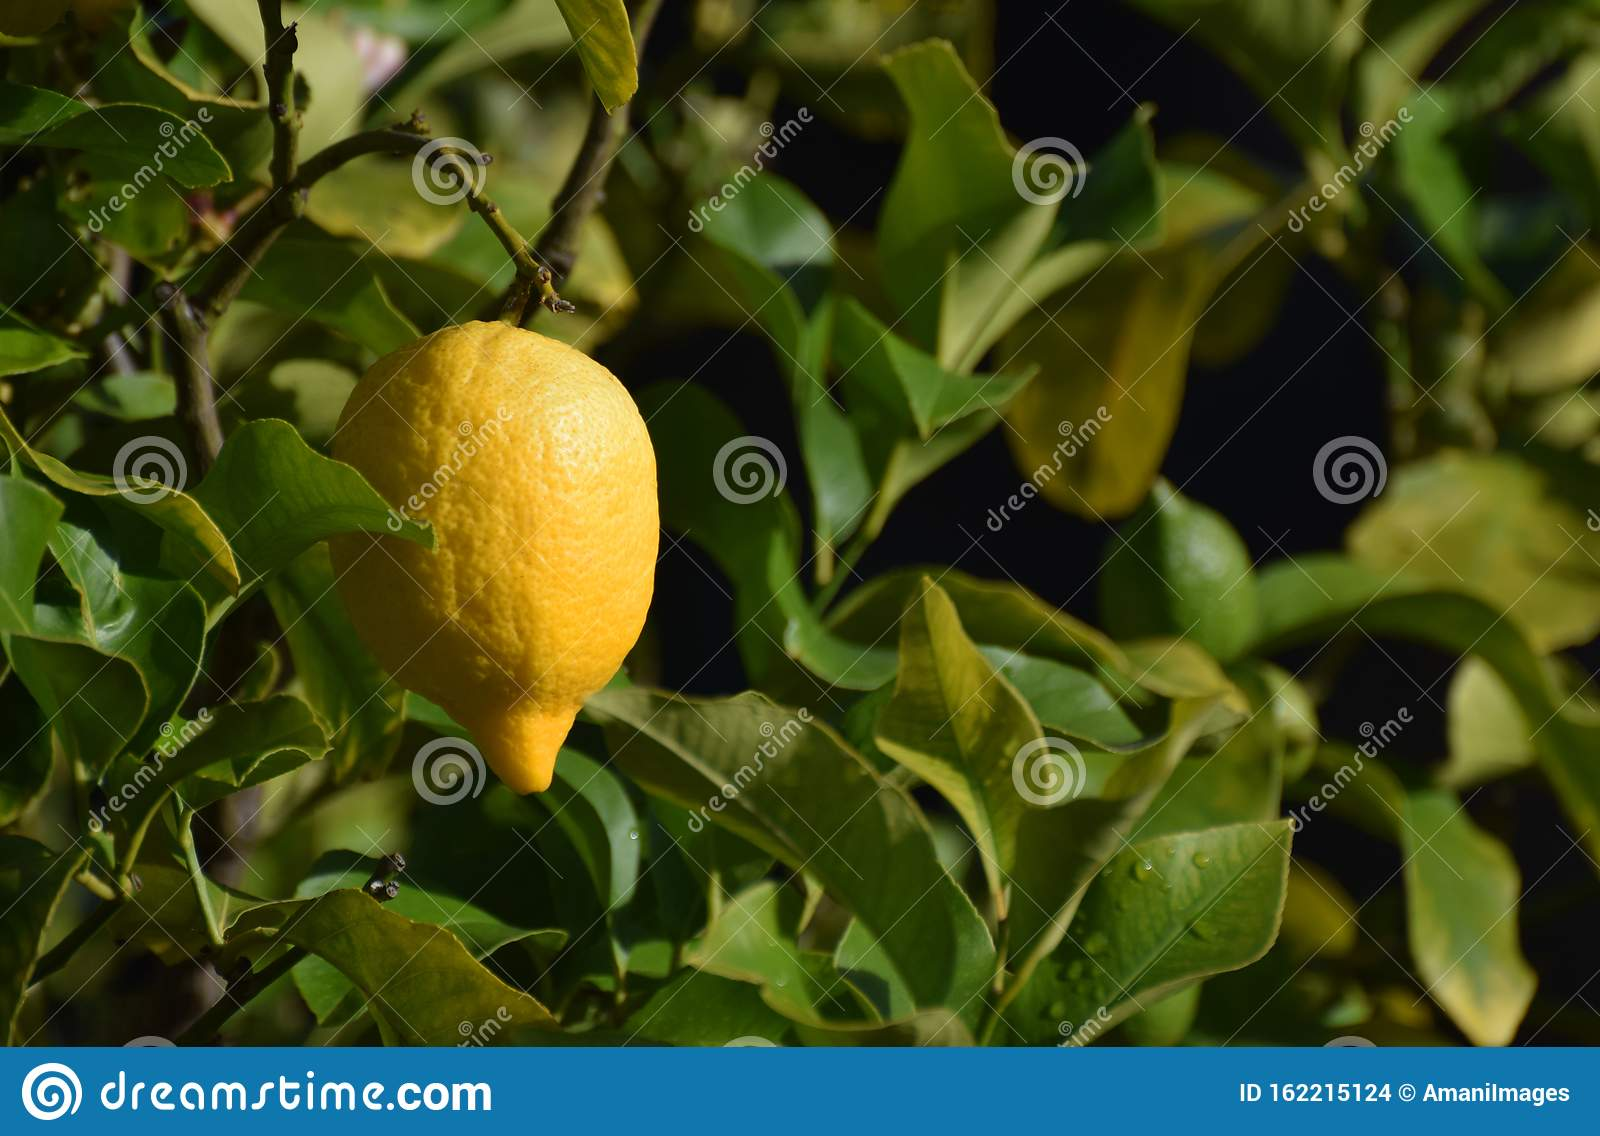 Ripe lemon fruit hanging on a tree